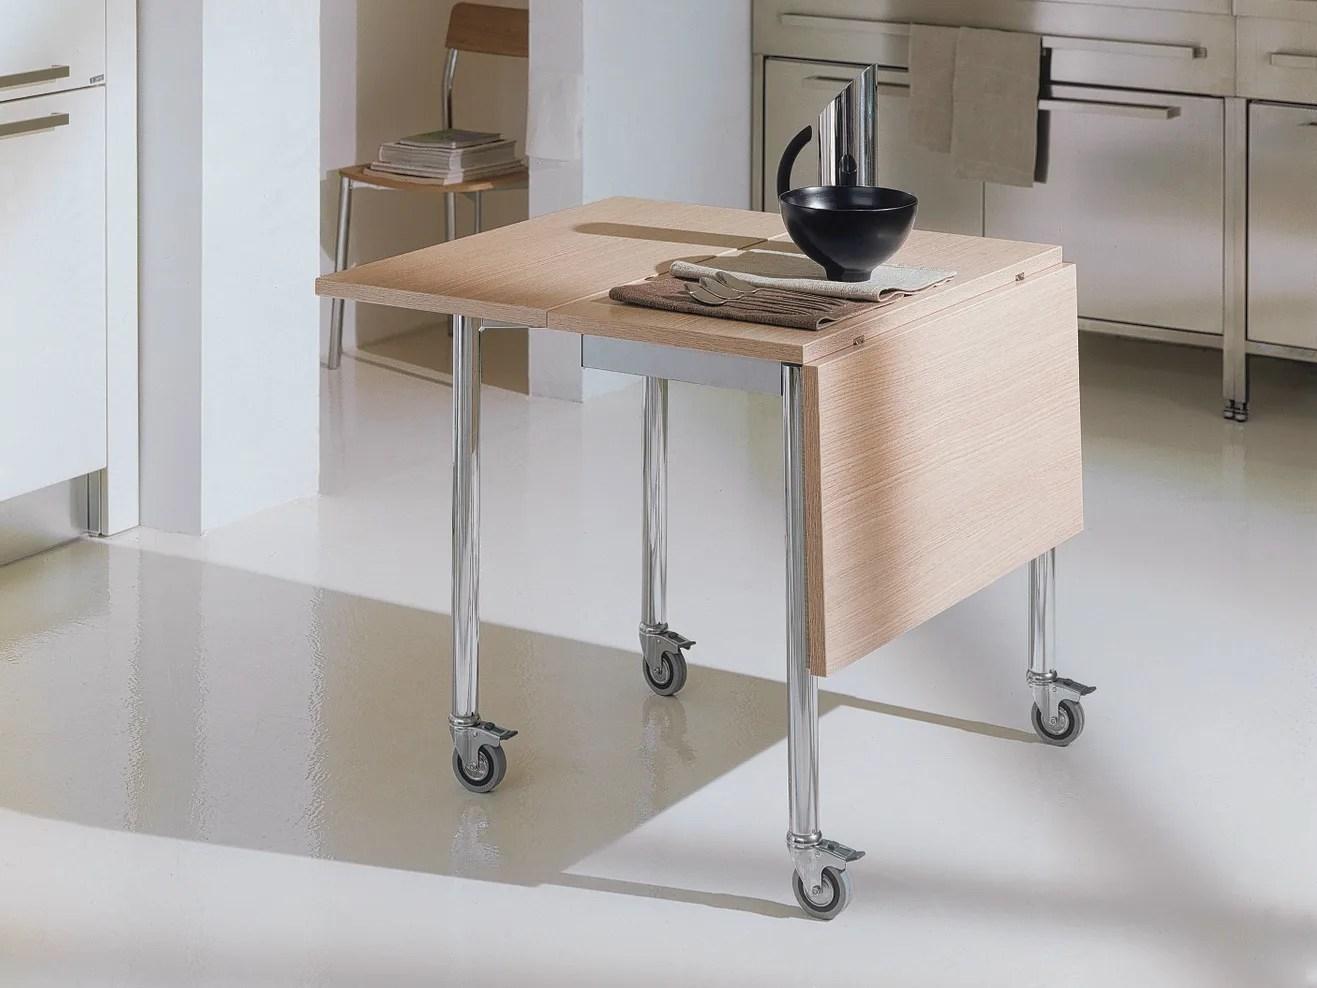 Tavolo A Ribalta Ikea.Cucina Tavolo A Scomparsa Ikea Gallery Of Best Ikea Cucina Per